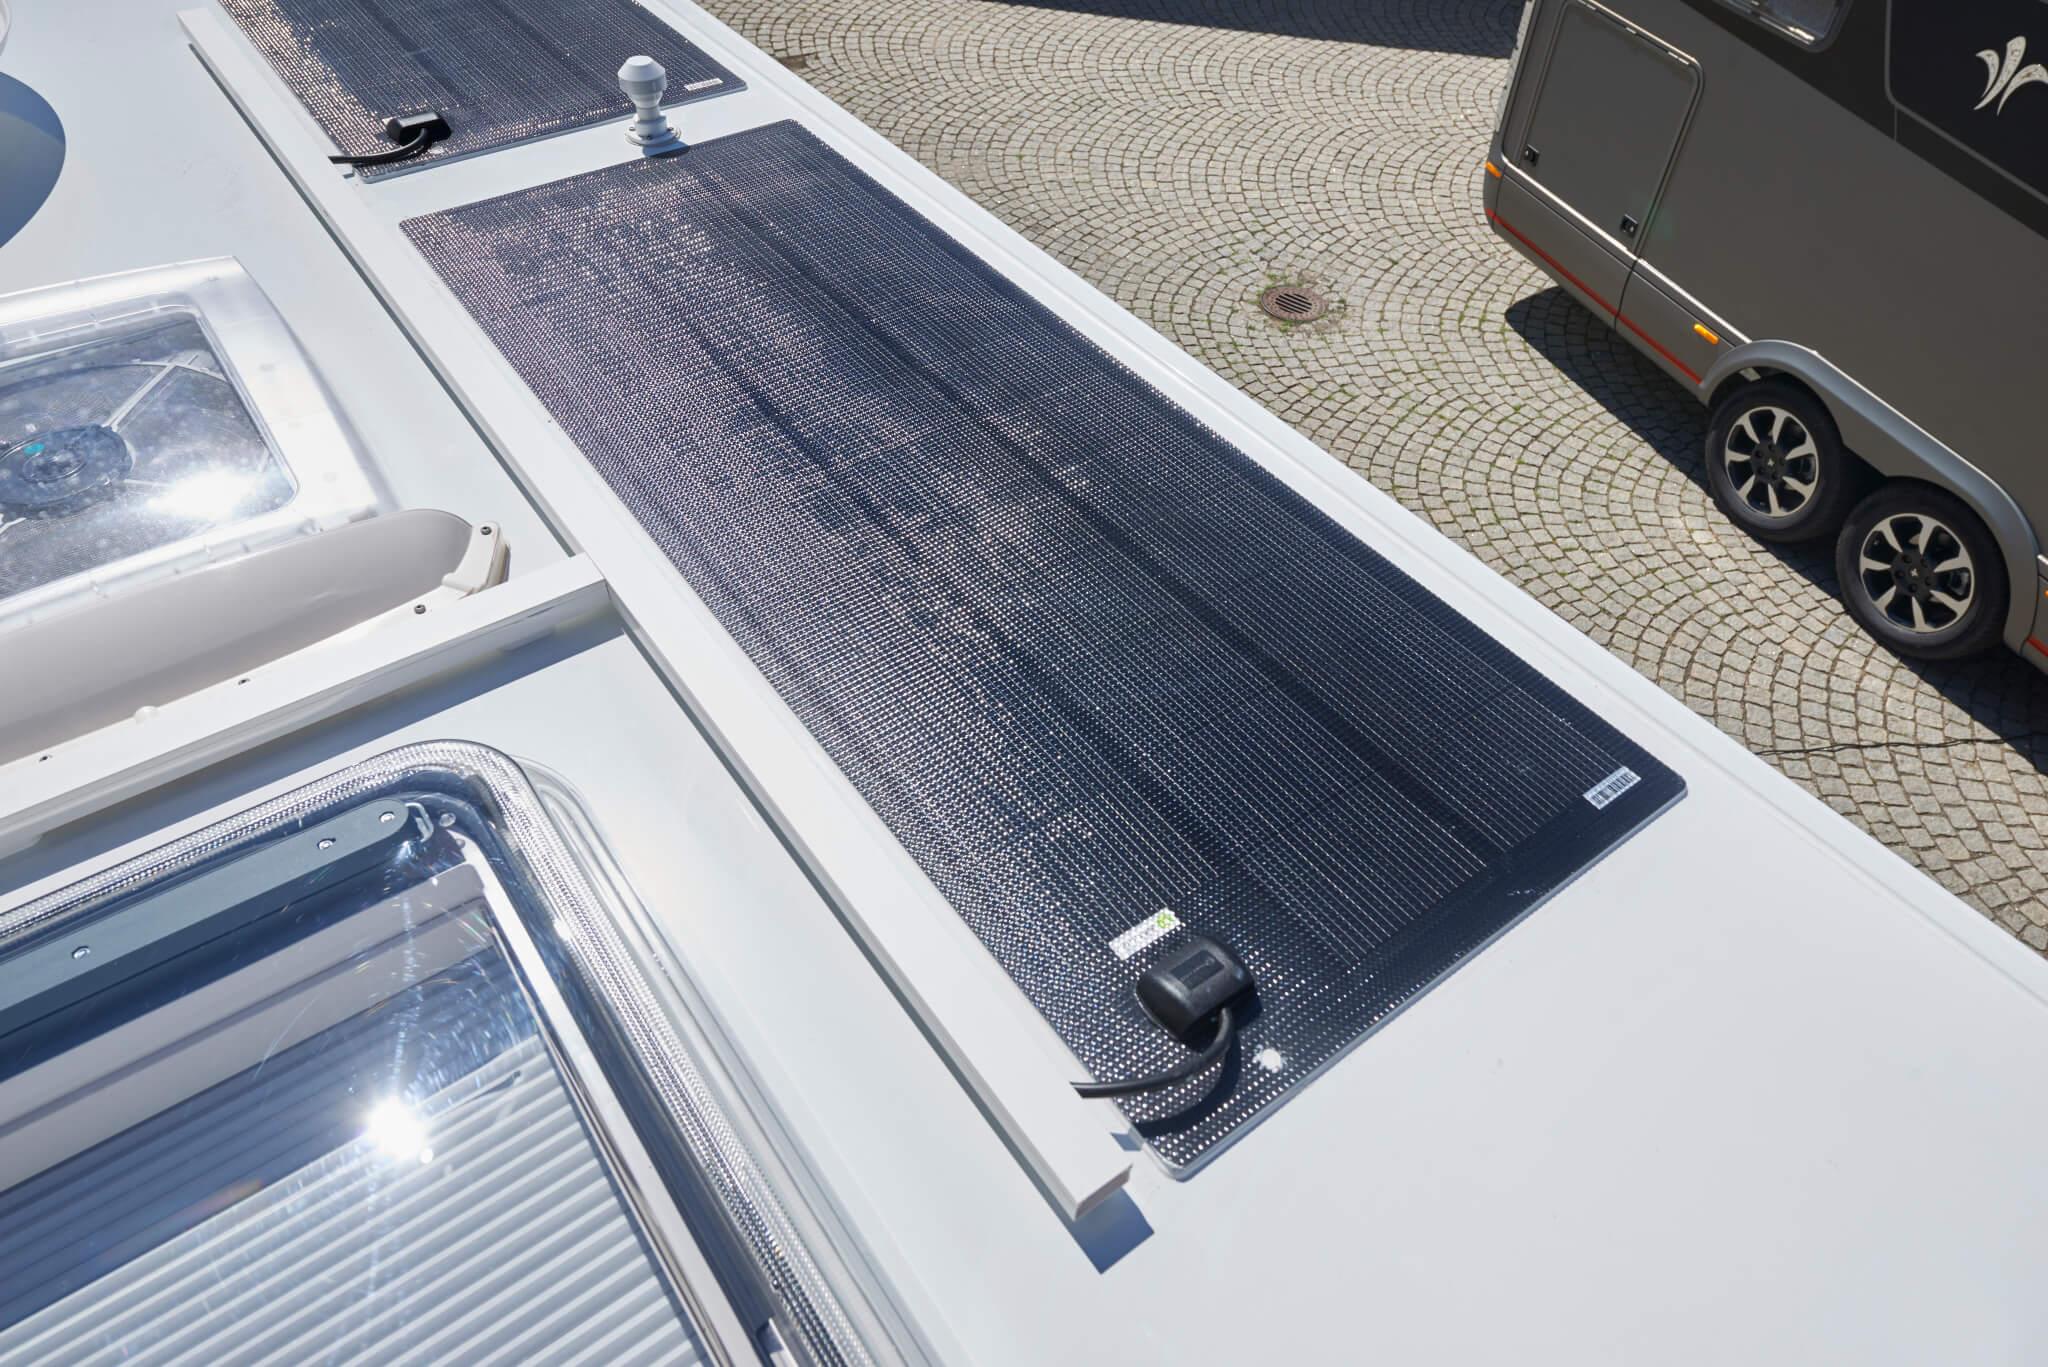 NIESMANN+BISCHOFF - Flair - Flair 920 LW - Panneau solaire - equipement energie lithium